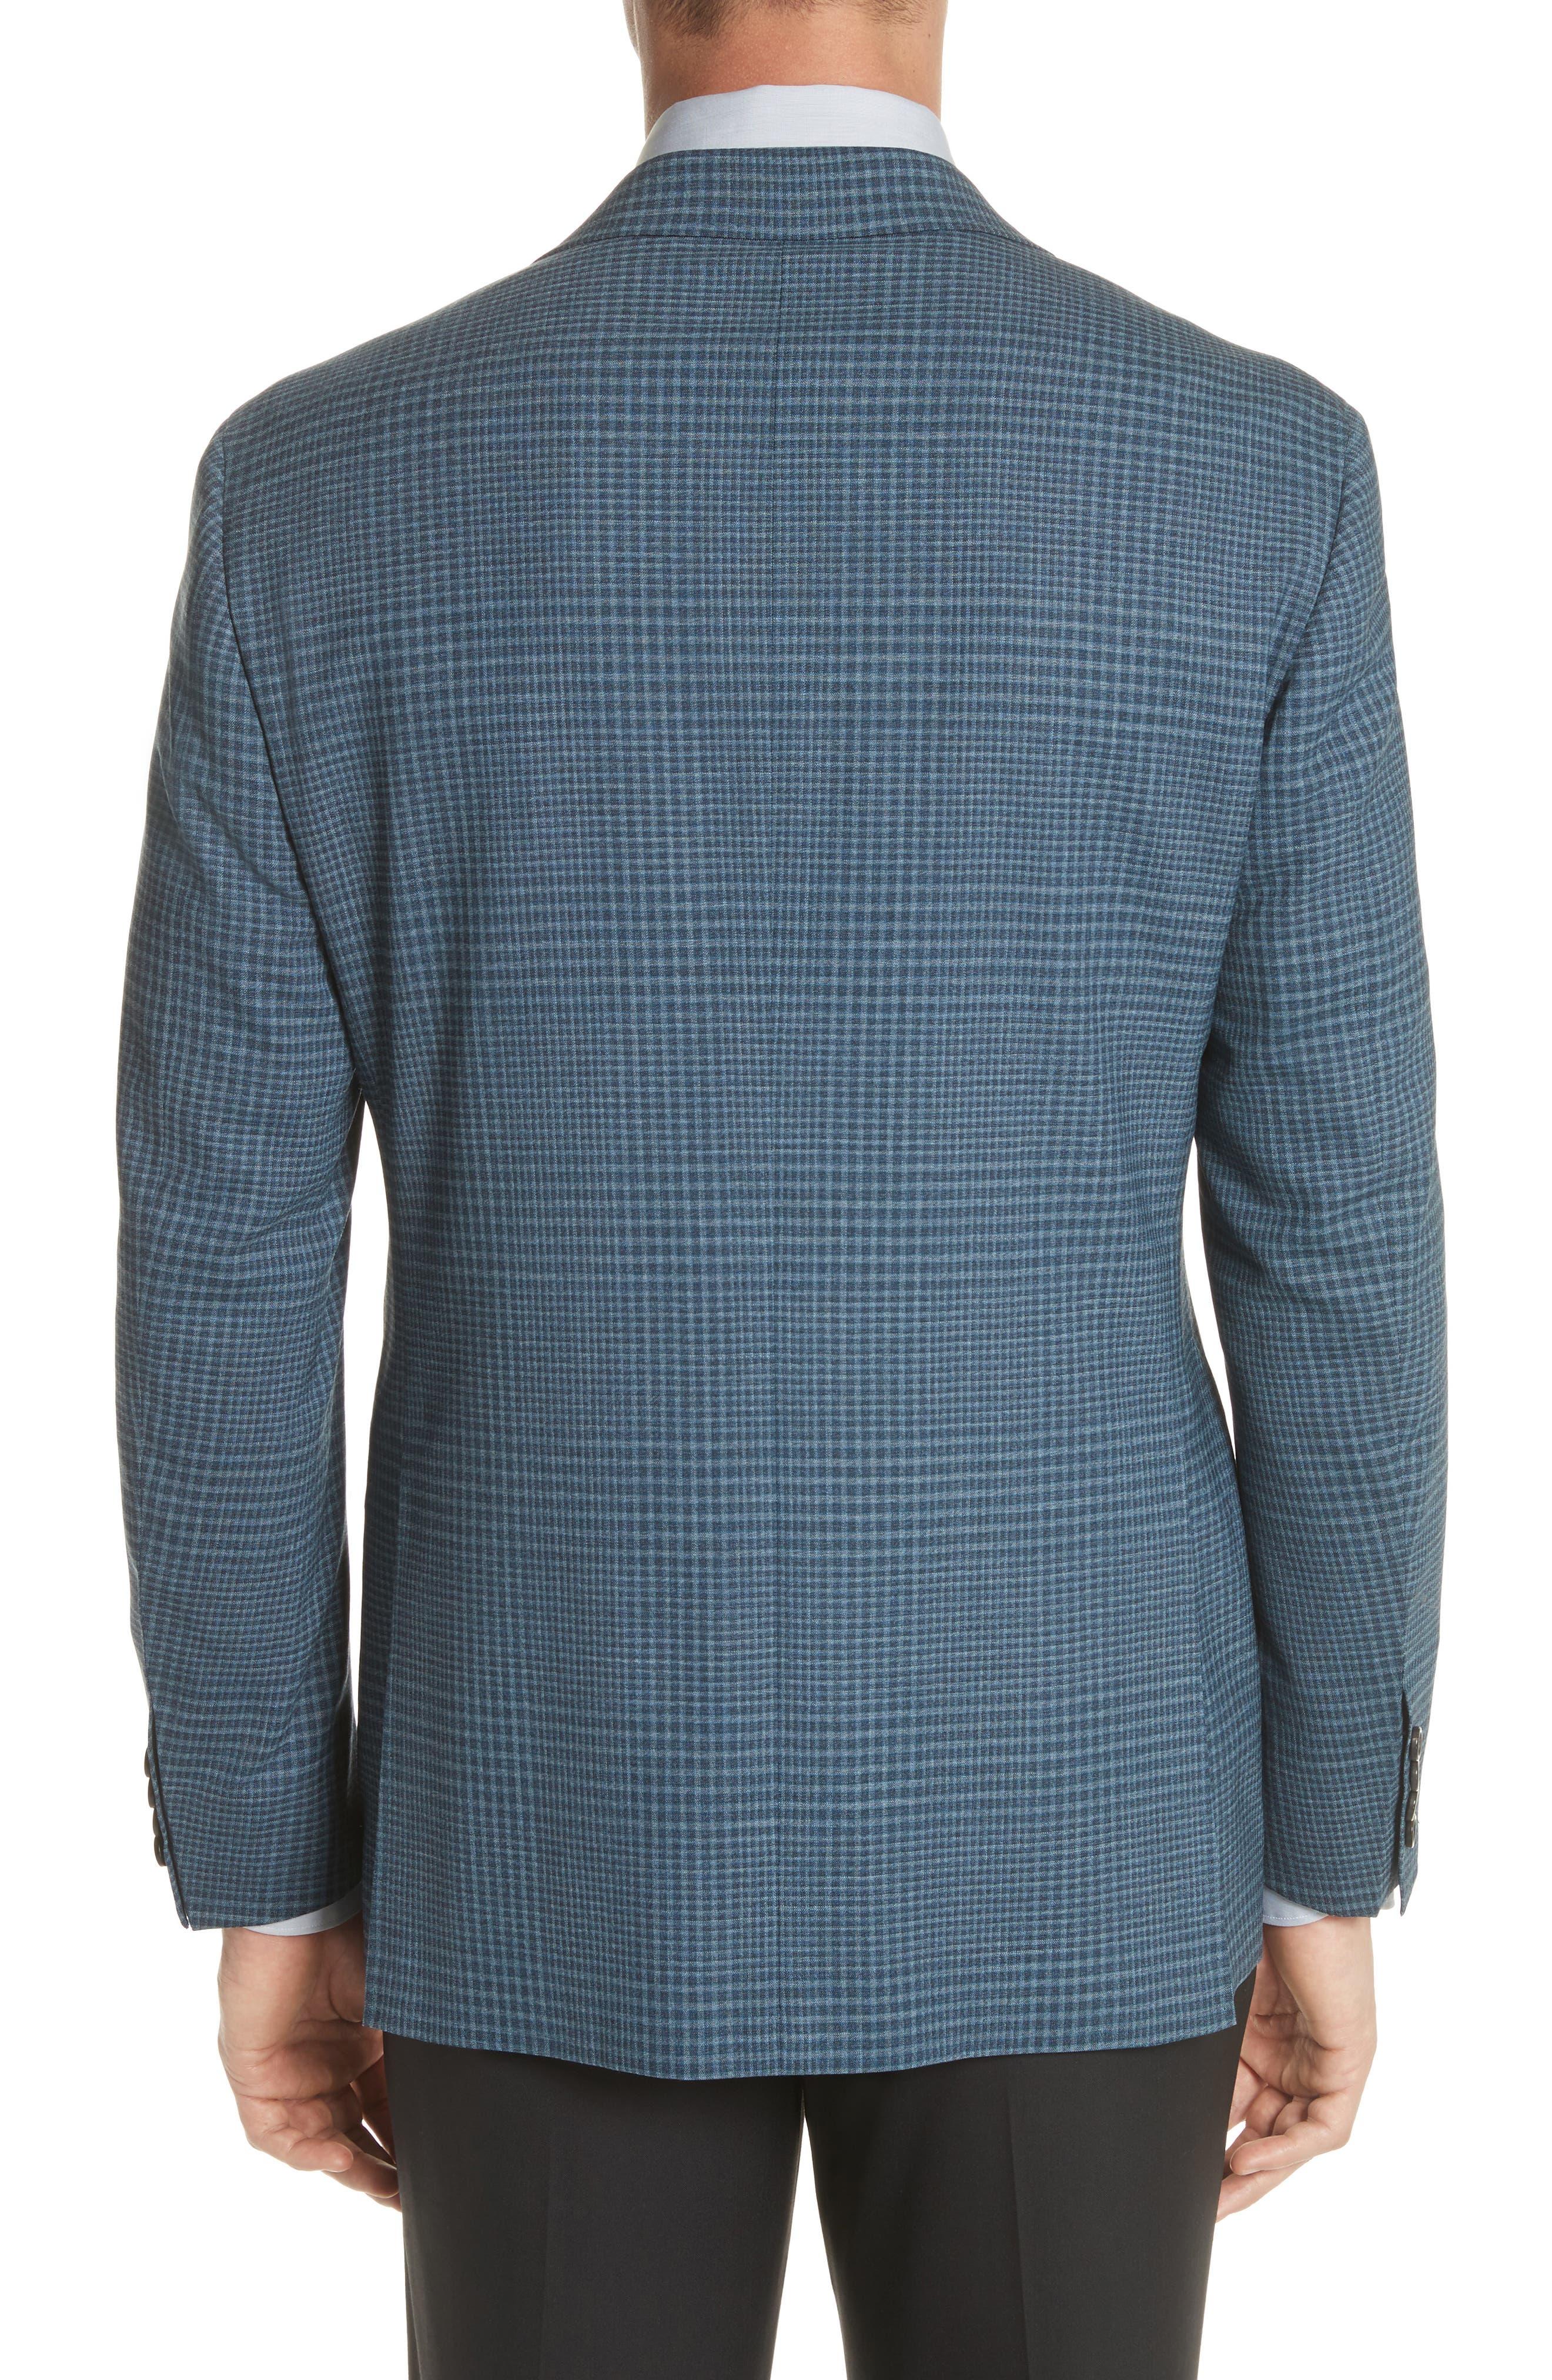 Kei Classic Fit Plaid Wool Sport Coat,                             Alternate thumbnail 2, color,                             400